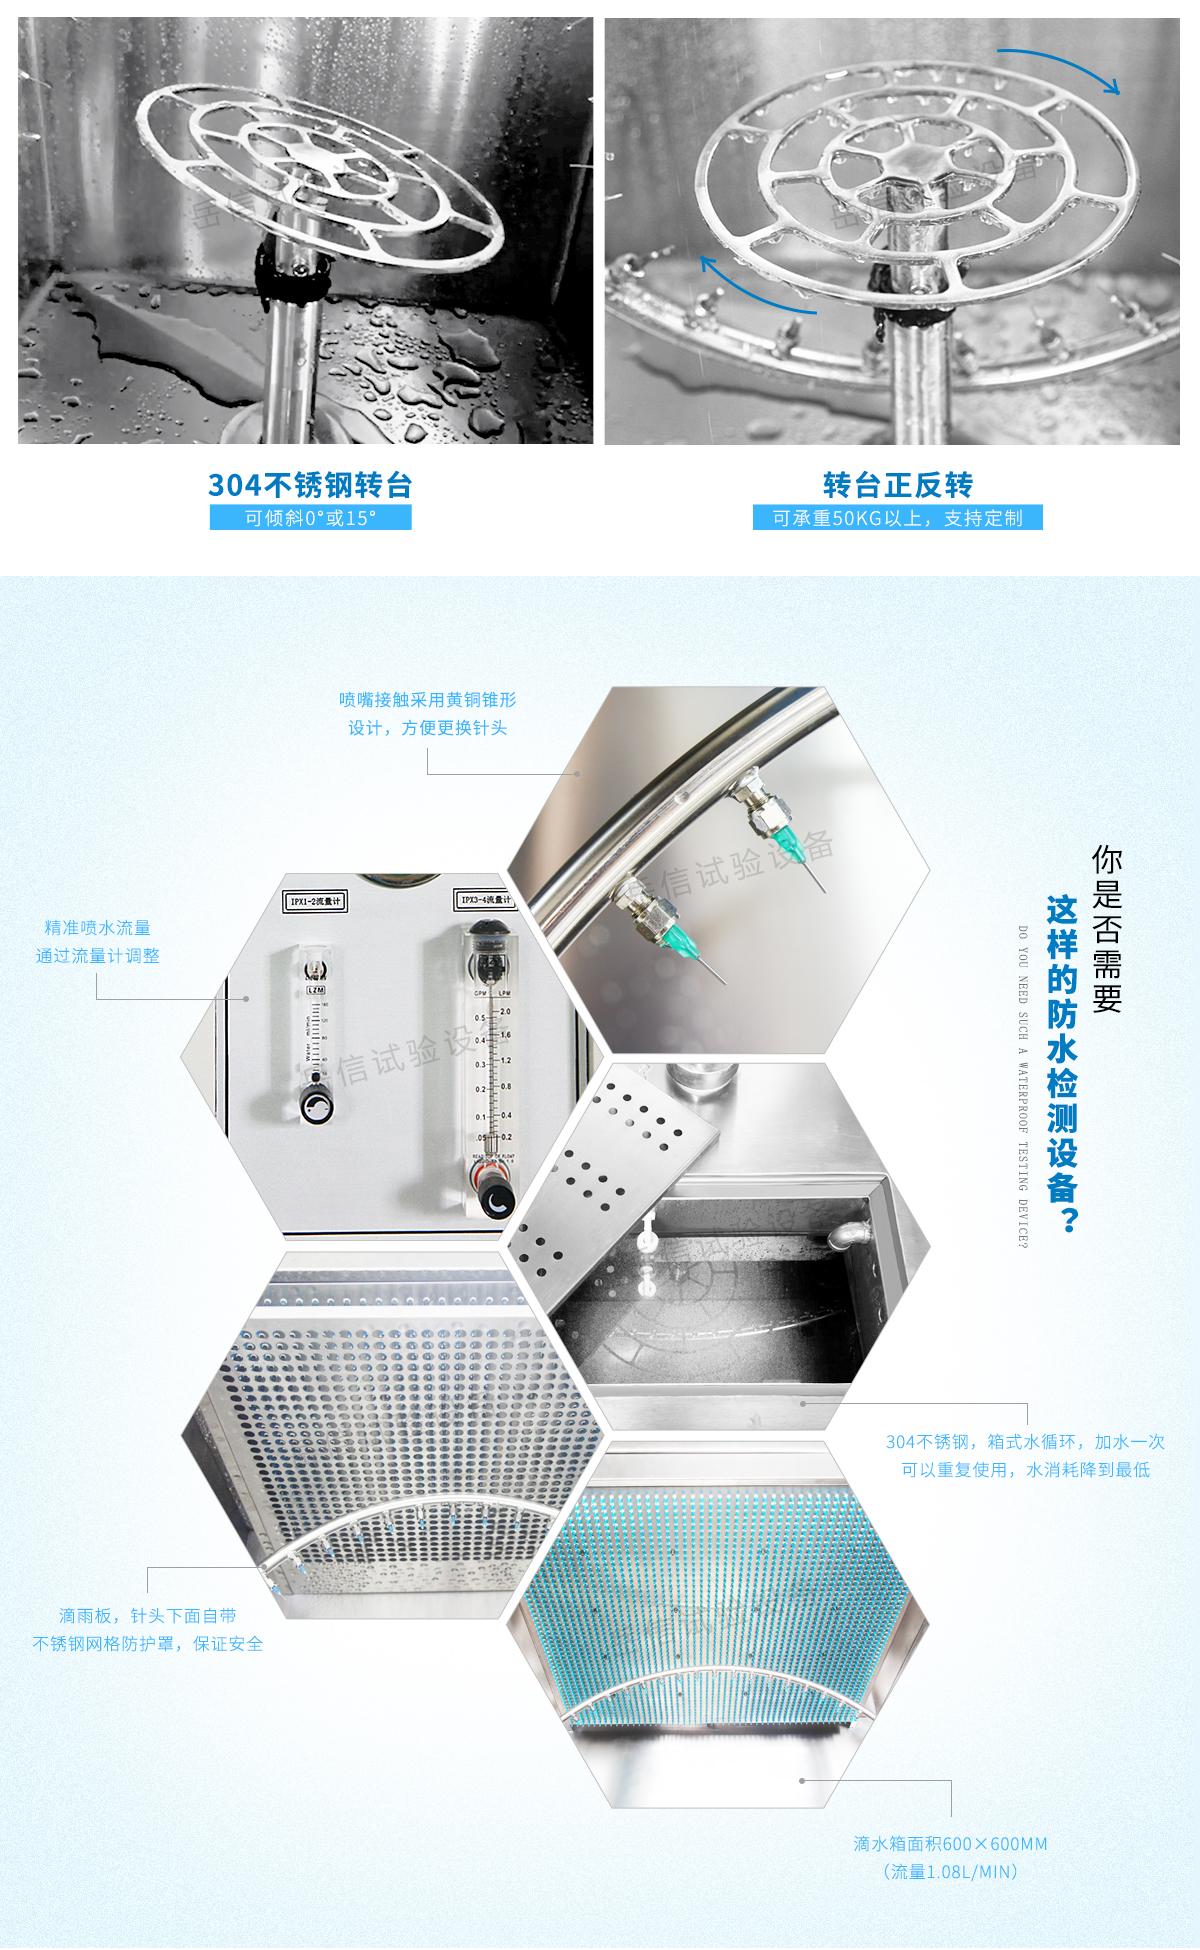 Built-in water storage tank 30L